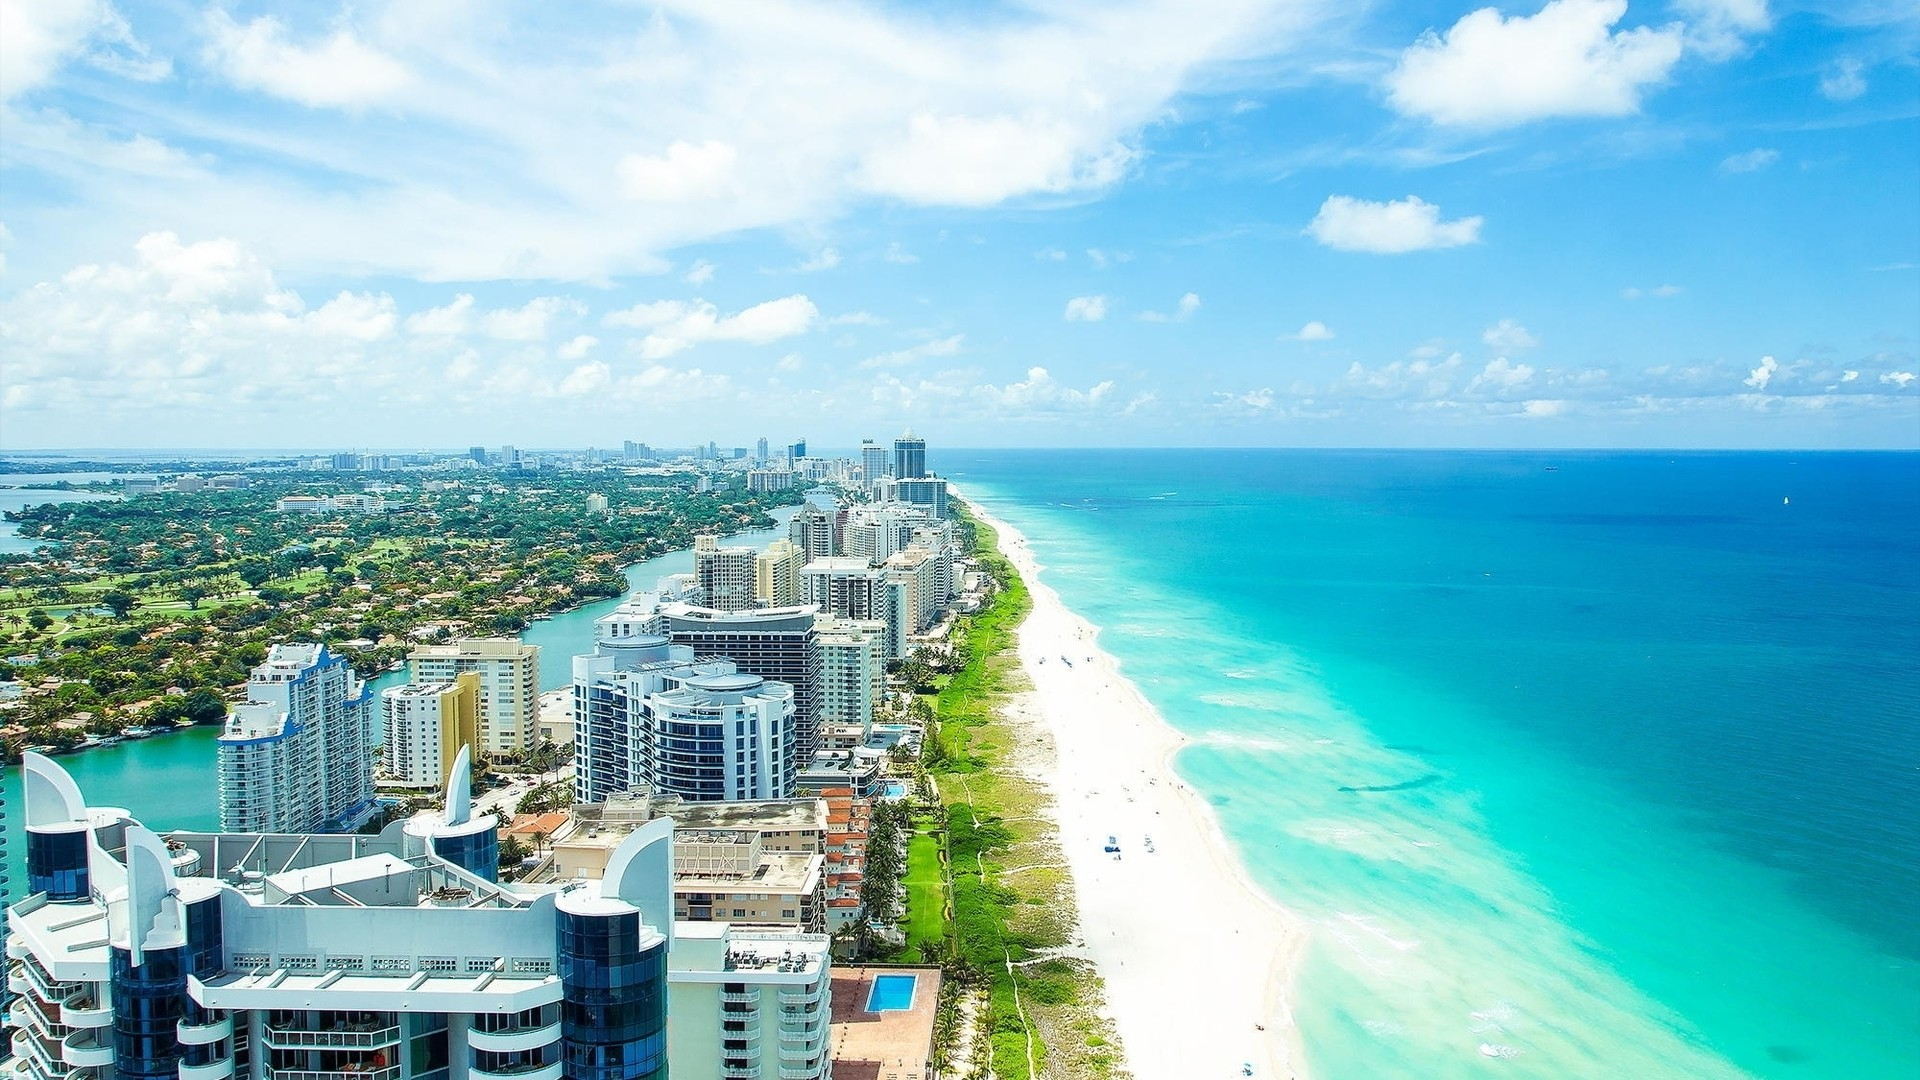 1920x1080 Miami Beach Wallpaper